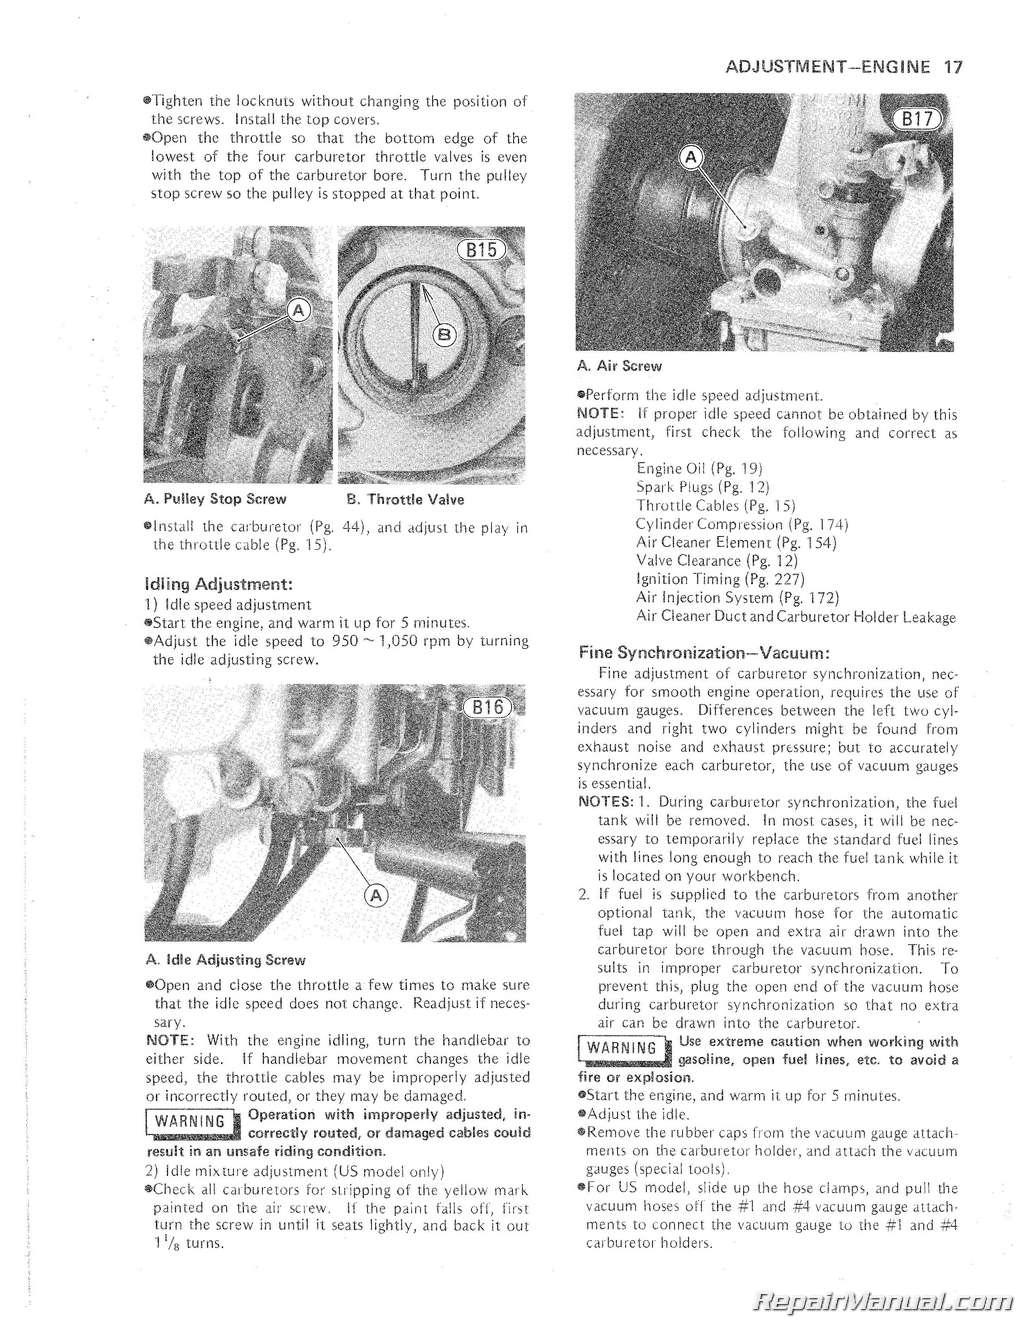 1979 1980 kawasaki kz1000e motorcycle service repair manual. Black Bedroom Furniture Sets. Home Design Ideas